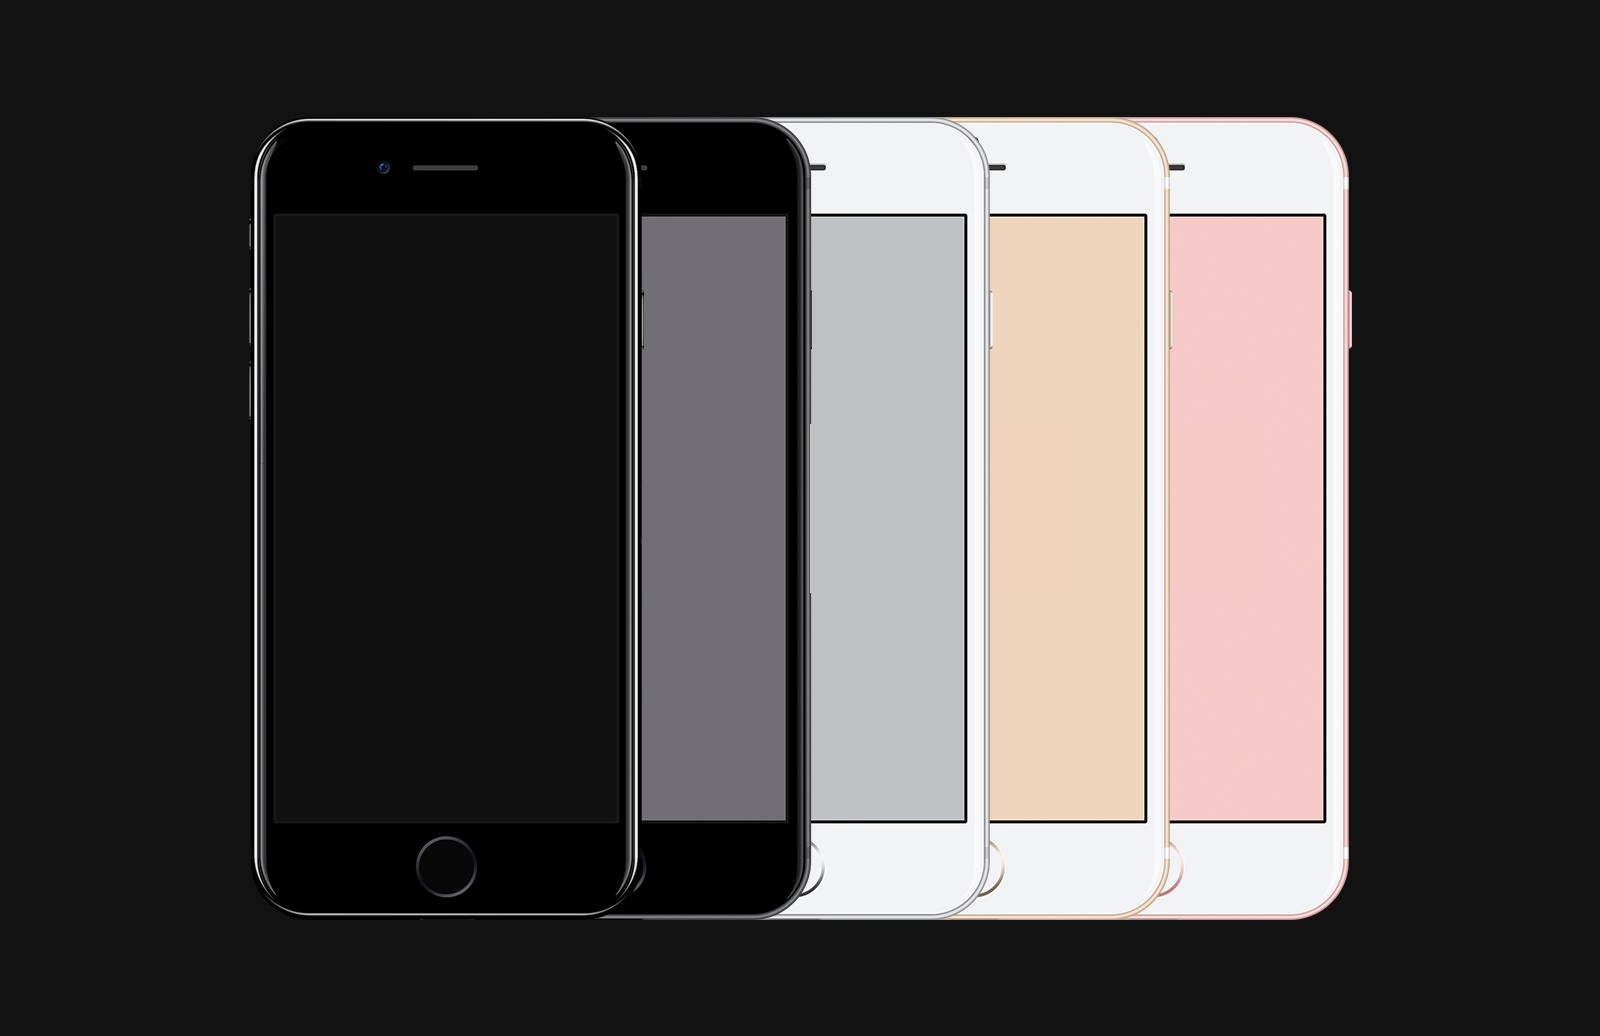 iPhone 7 - Free PSD Mockup 2